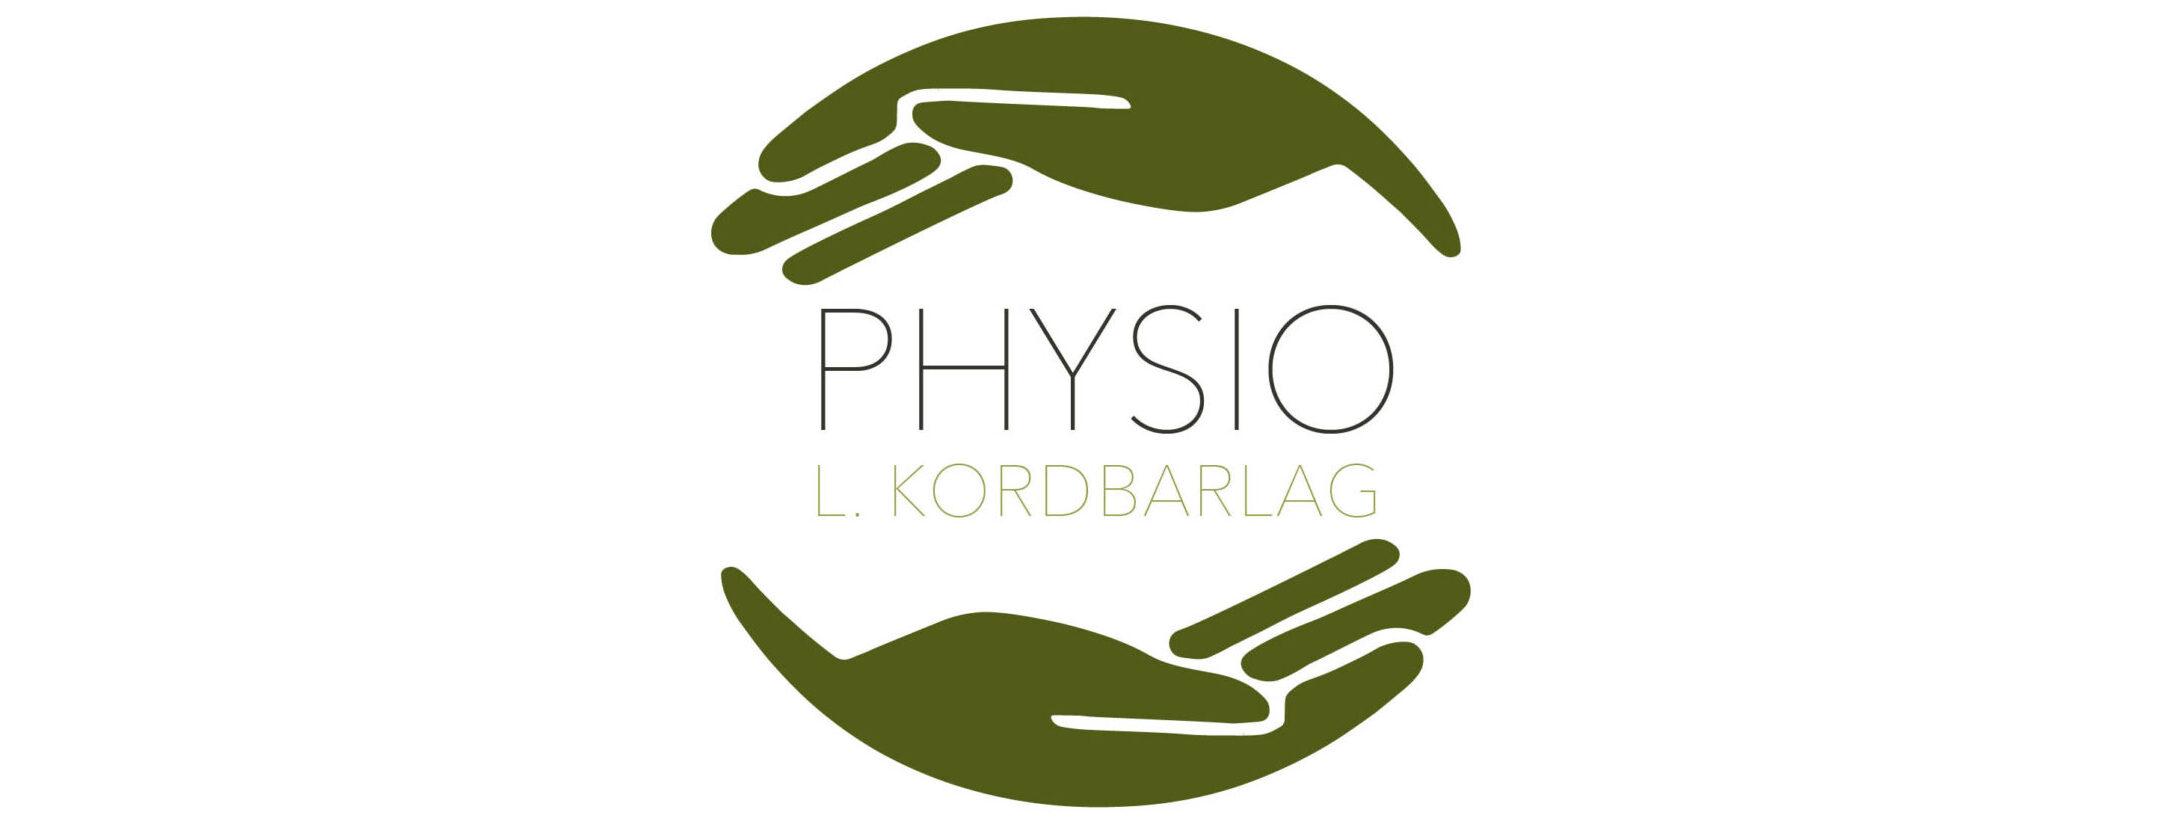 Physio L. Kordbarlag